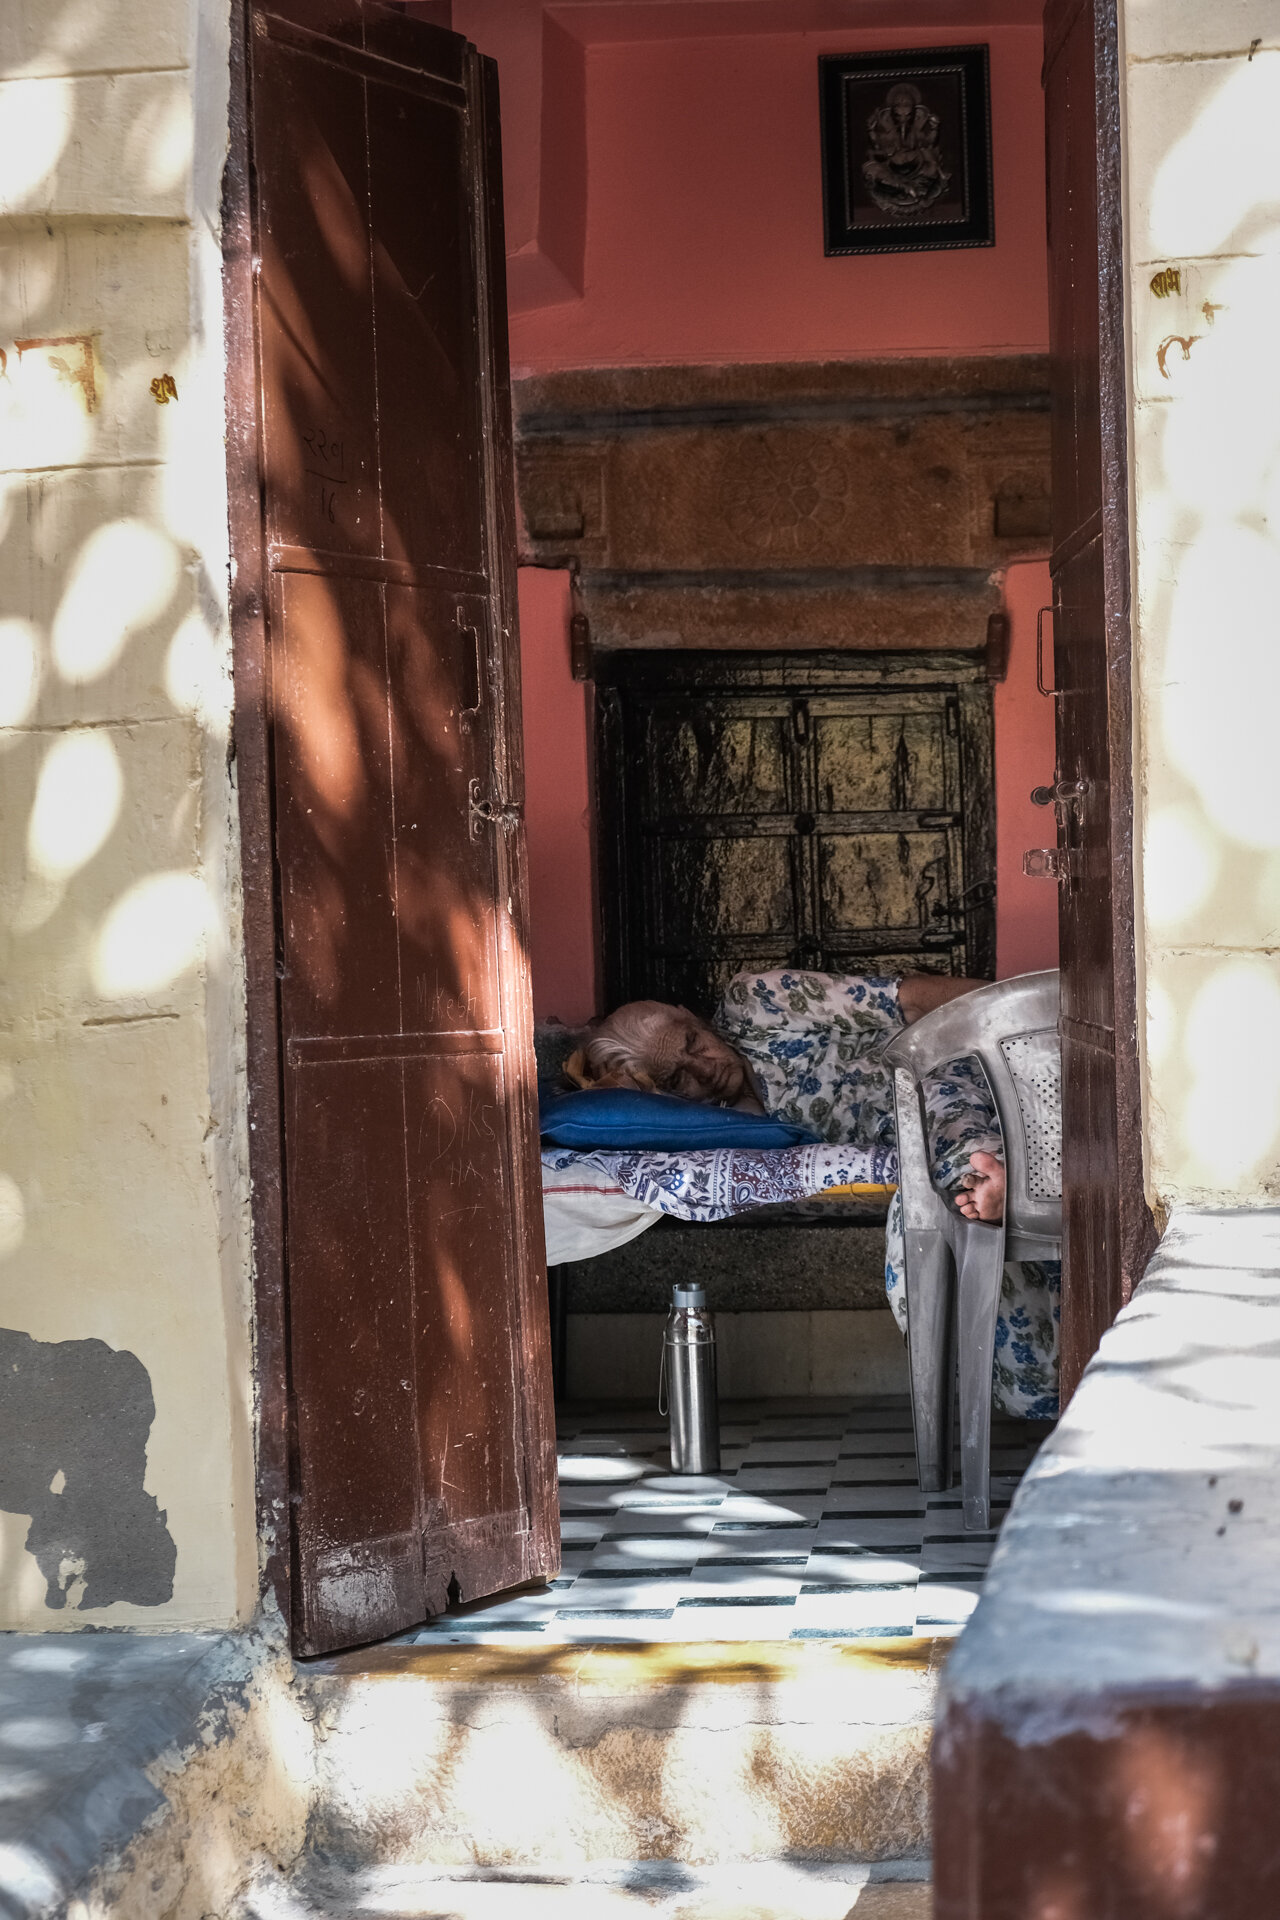 Brahmin lady asleep.